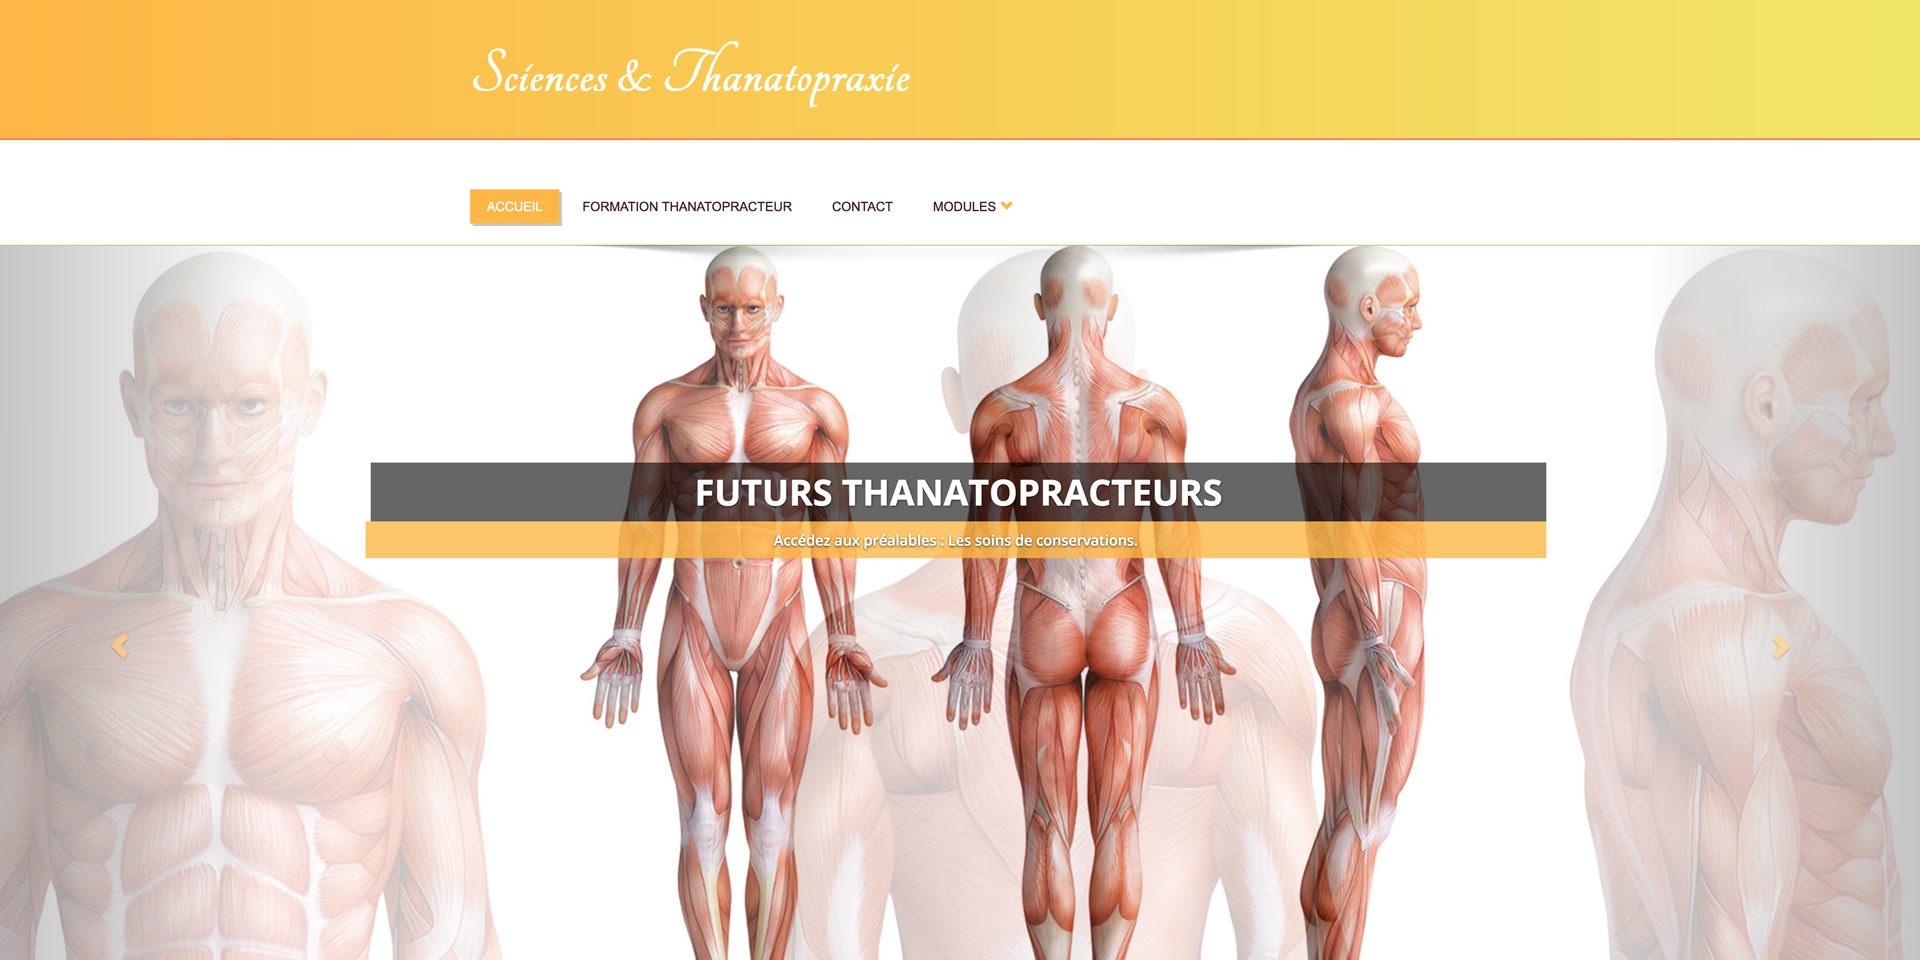 sciences-thanatopraxie